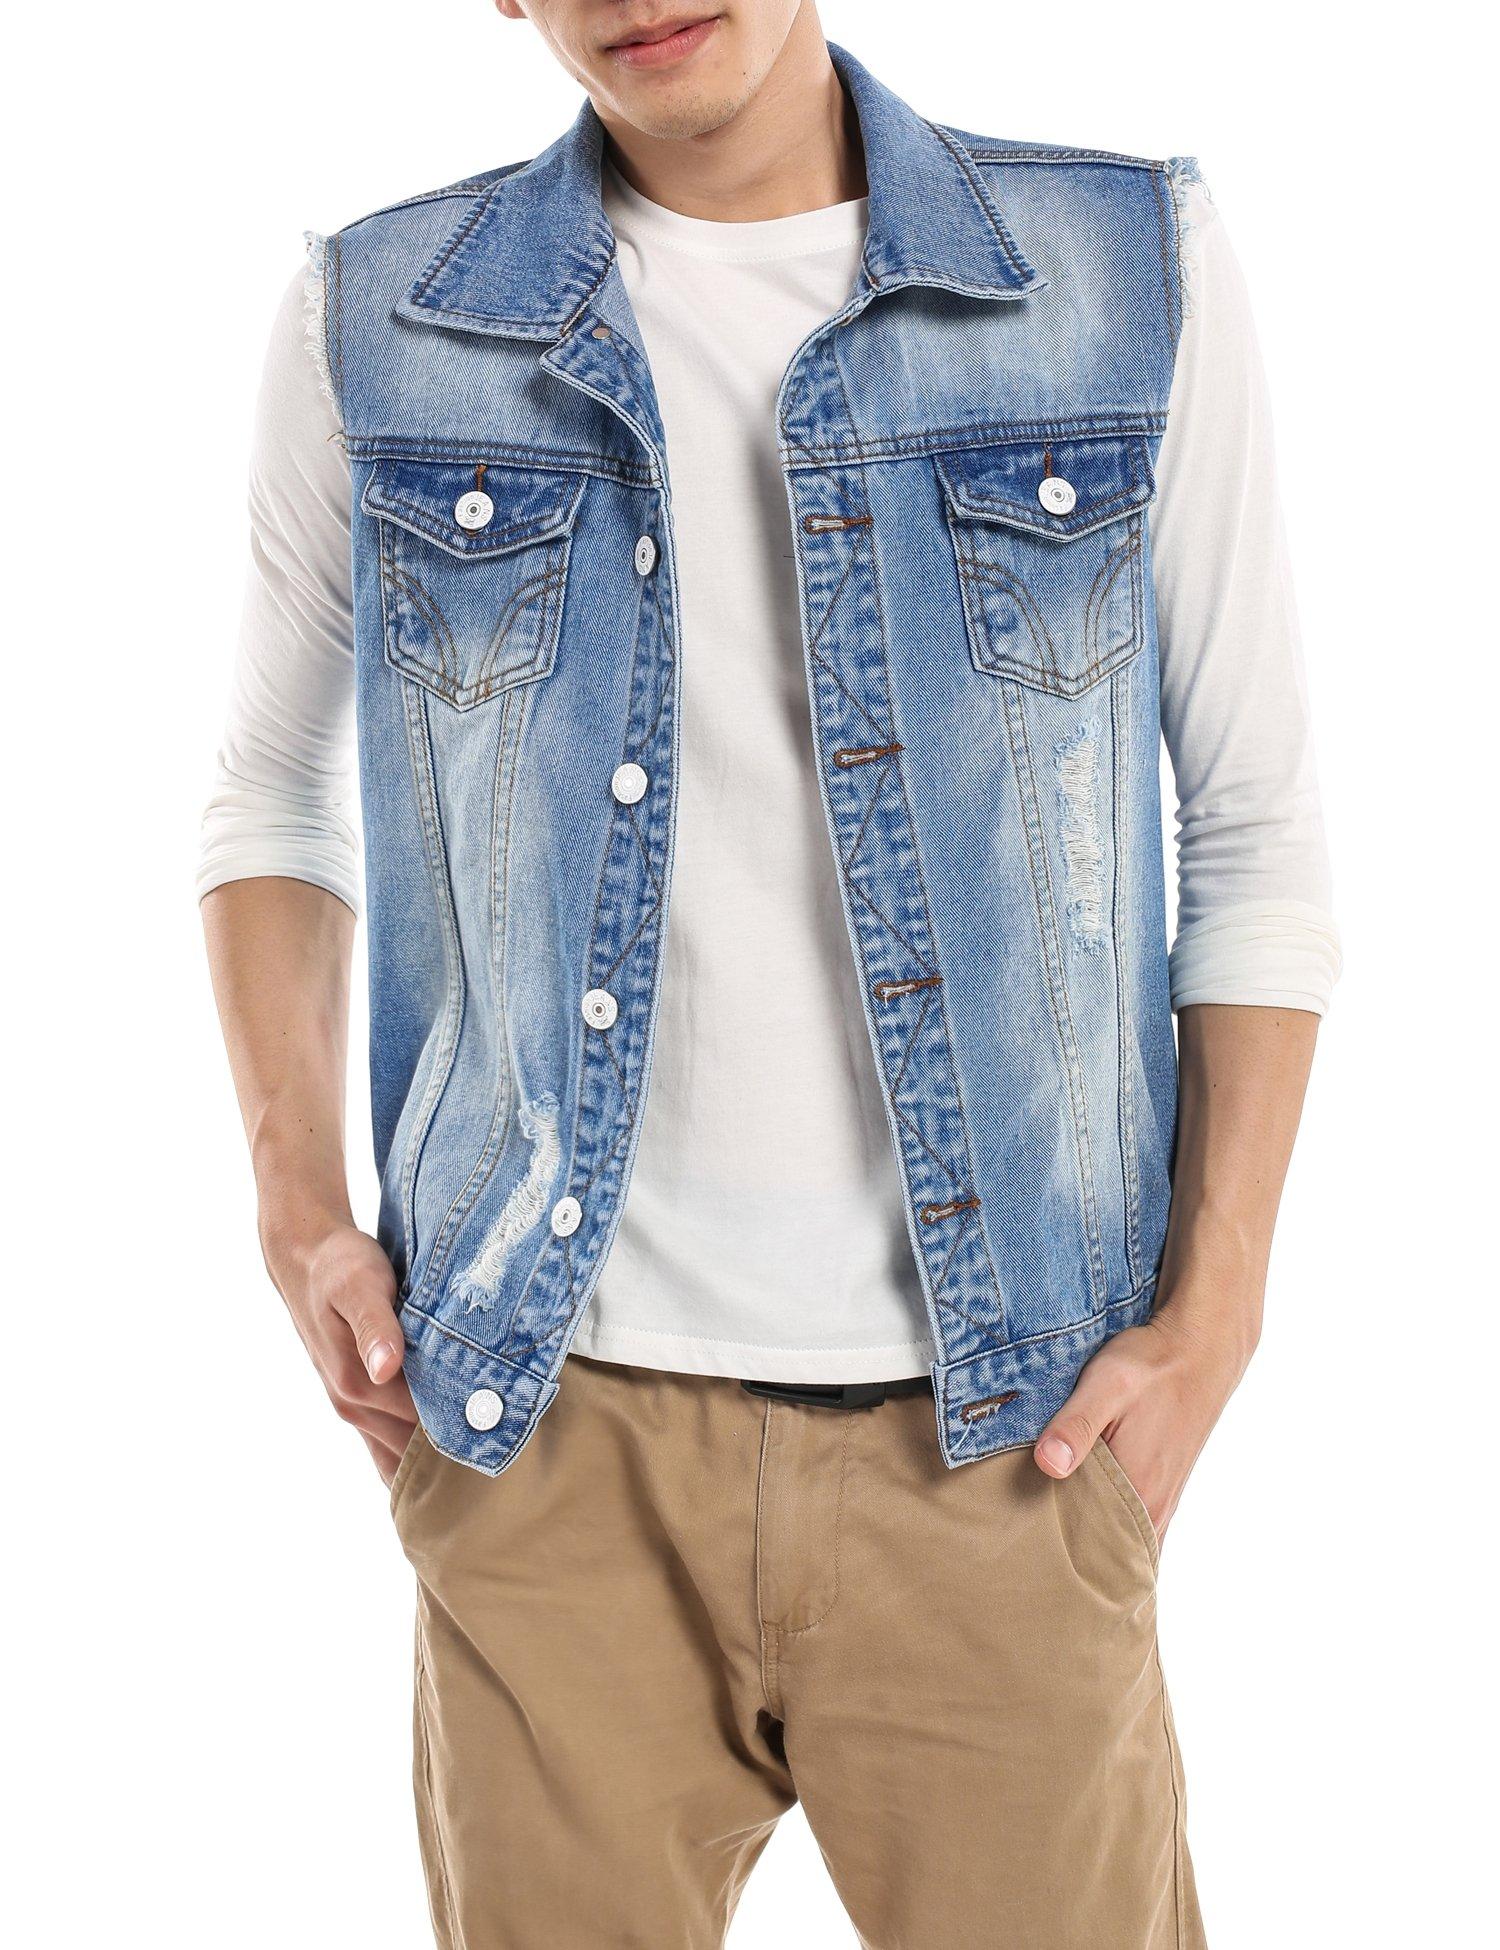 COOFANDY Men's Fashion Sleeveless Lapel Denim Vest Jacket,Light Blue,Large